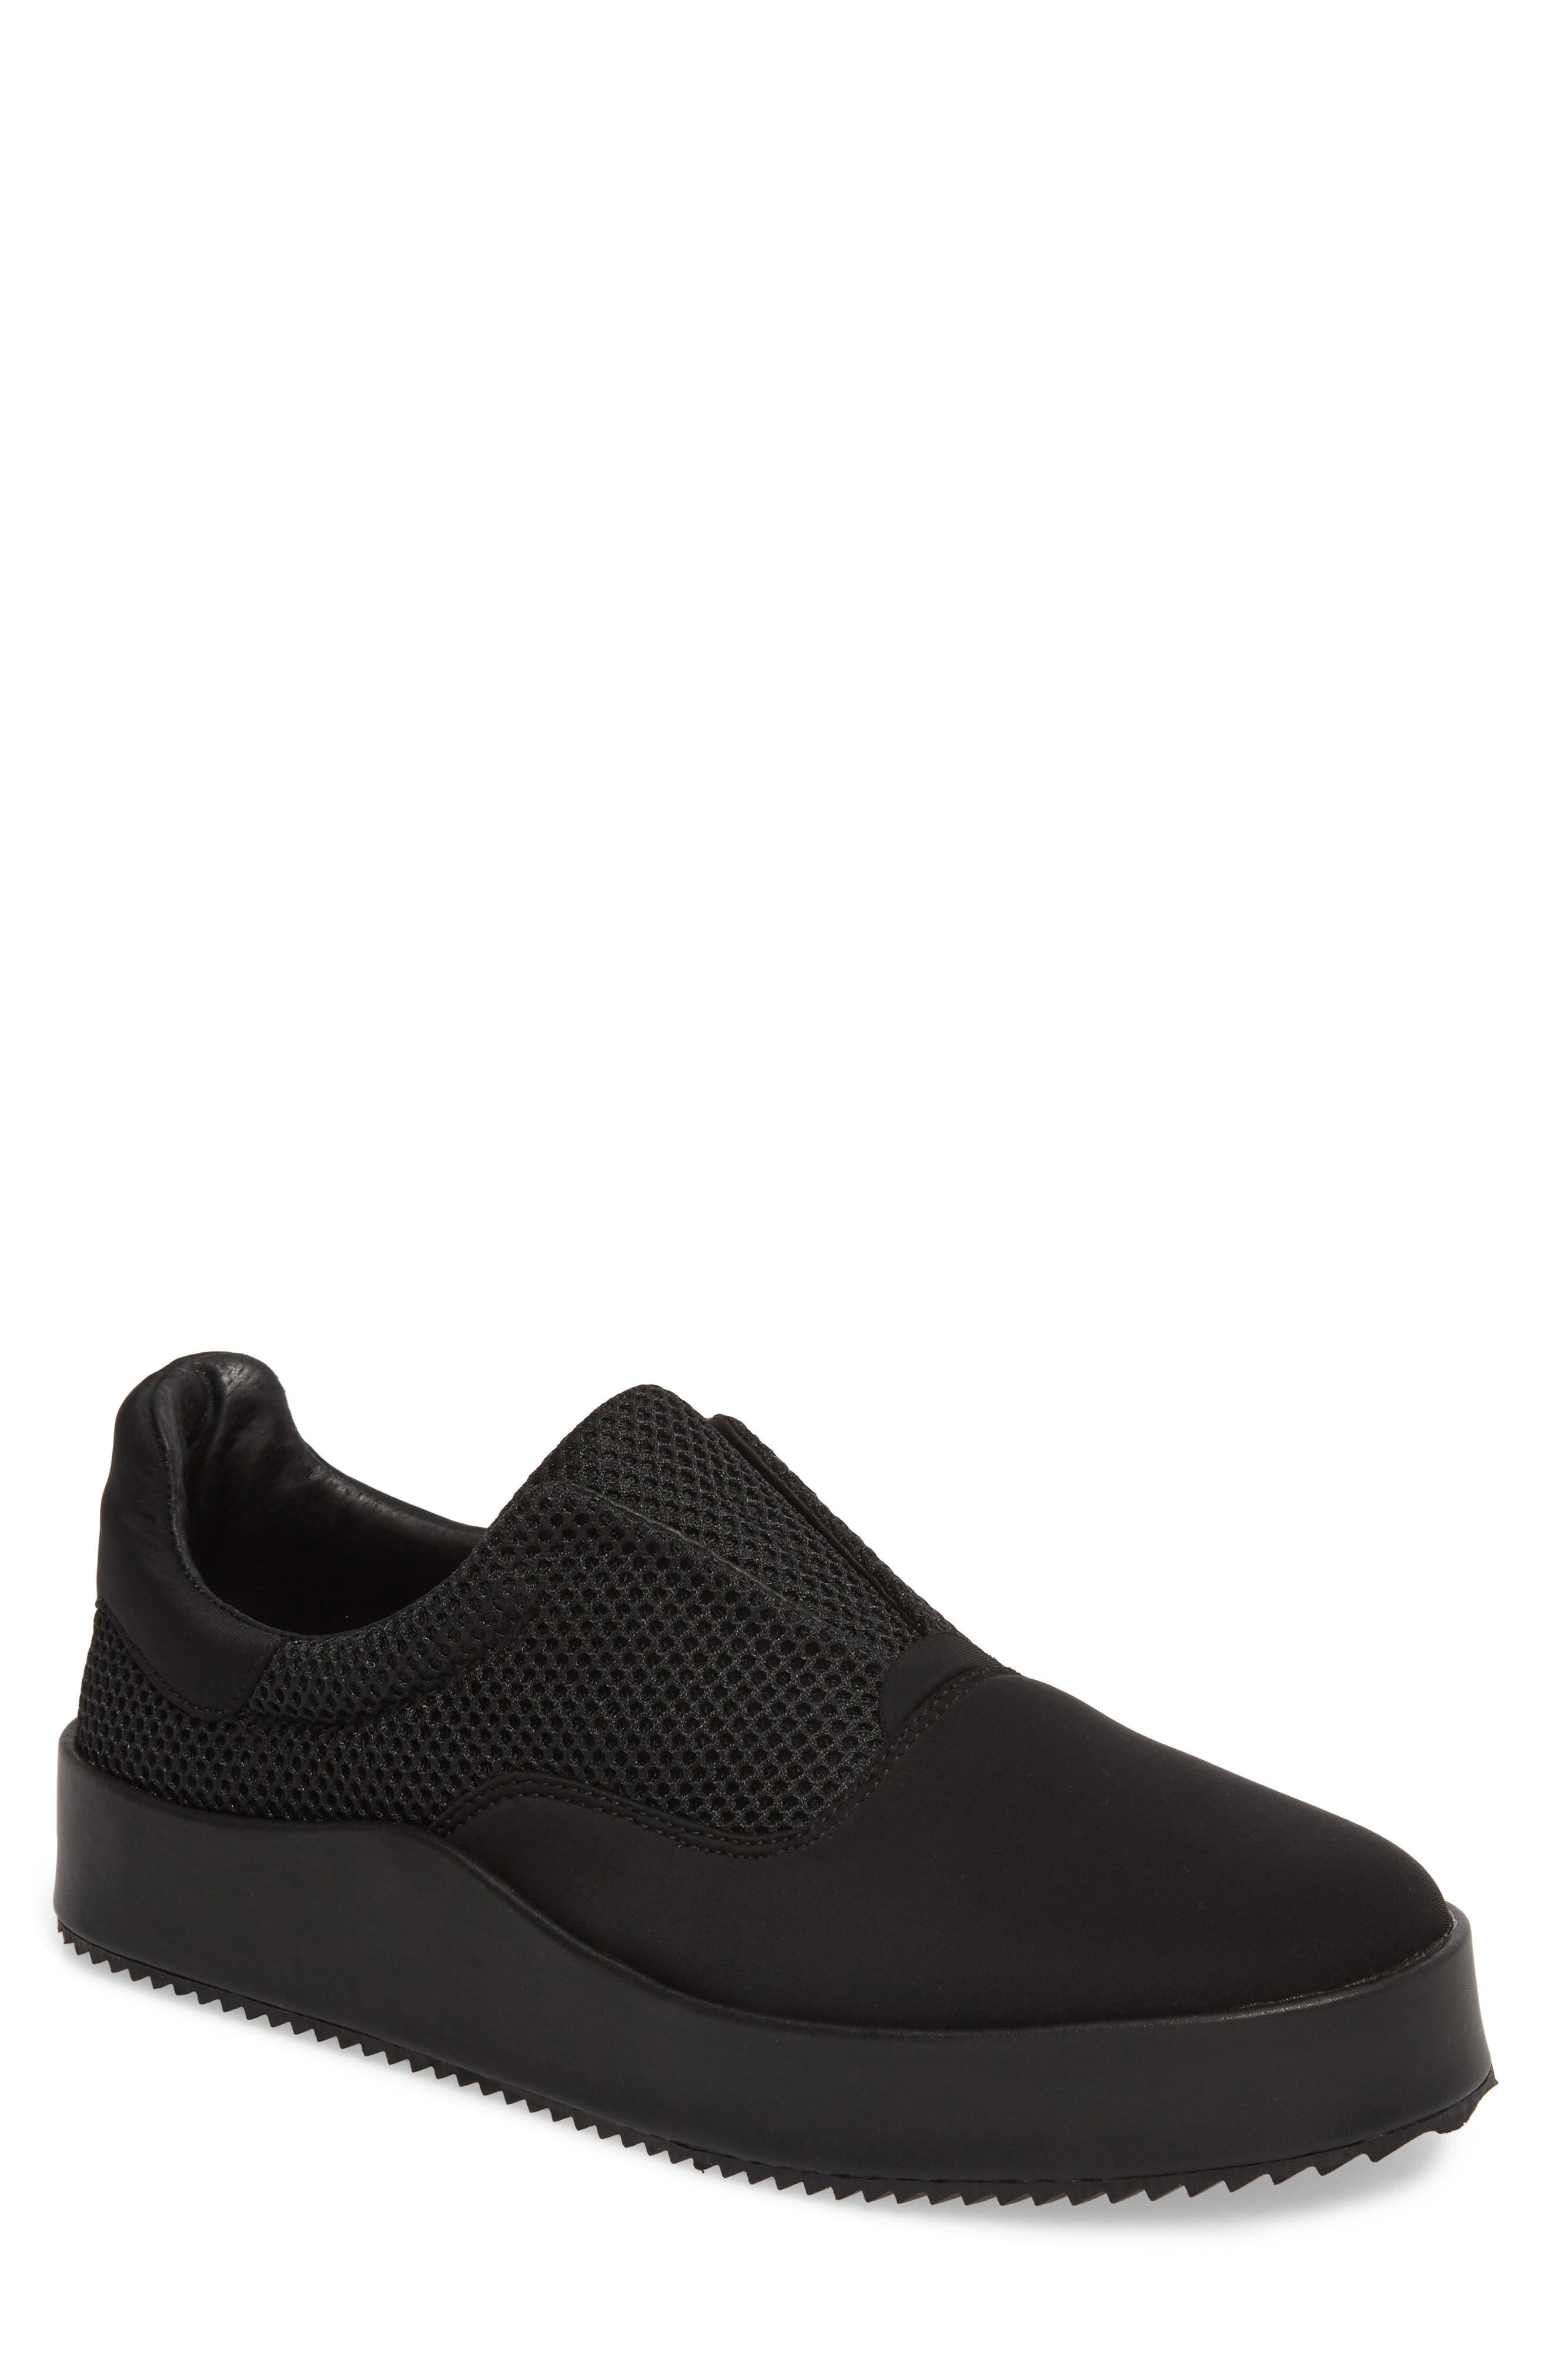 Core Neoprene Skater Laceless Sneaker,                         Main,                         color, Black Neoprene Fabric